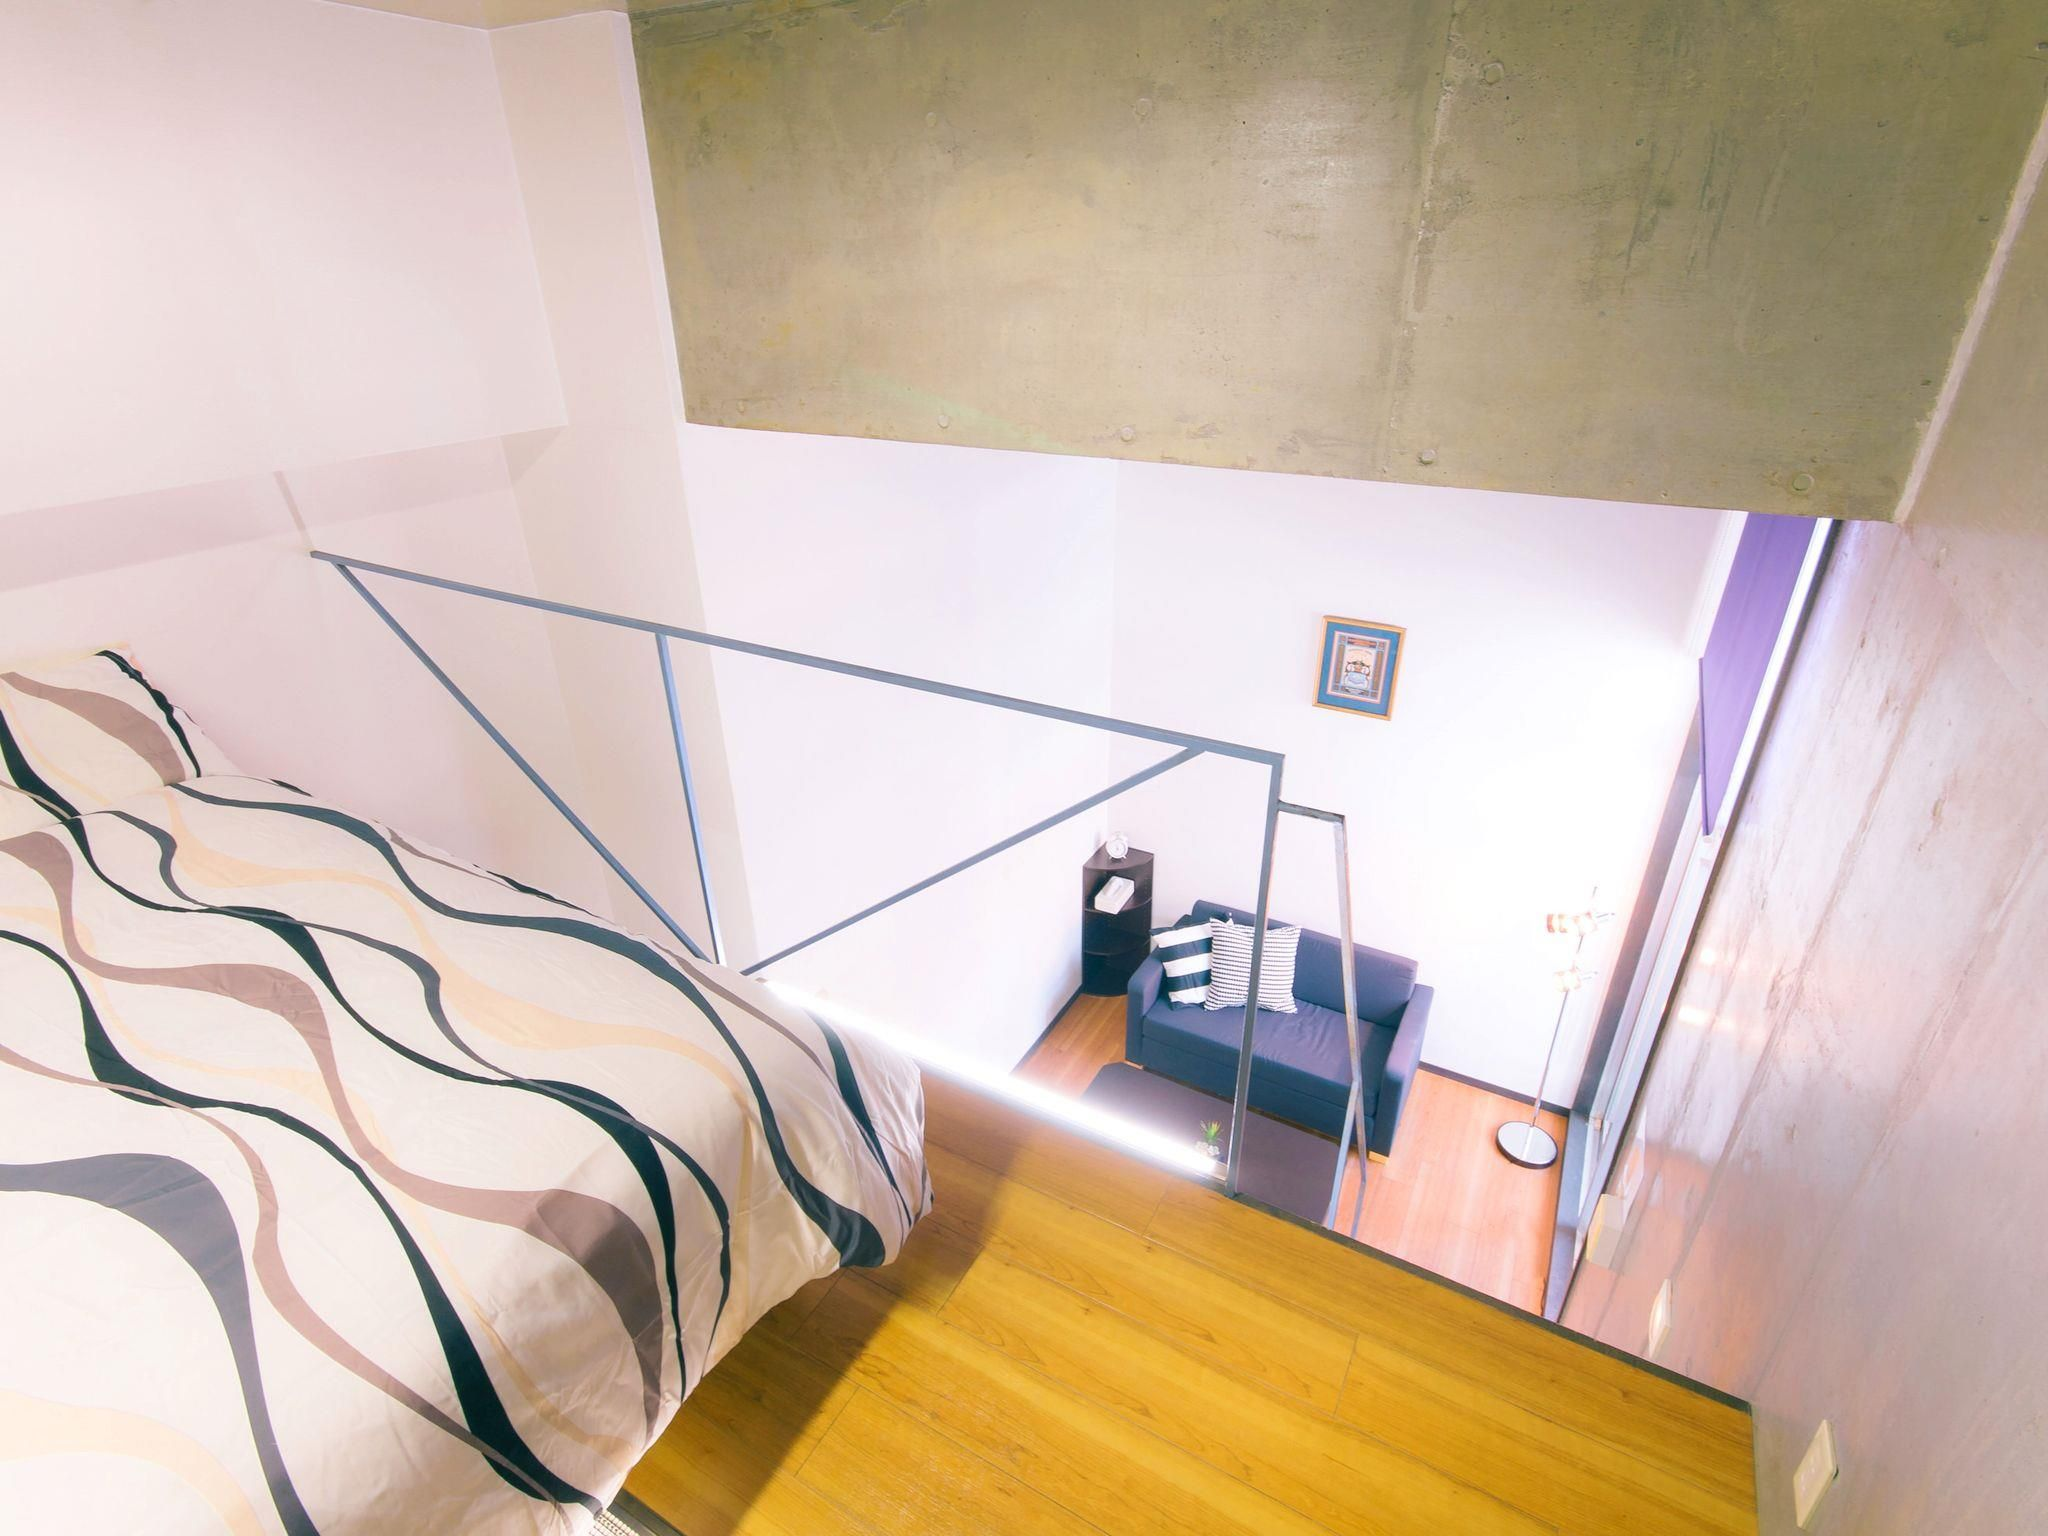 Osaka Cw Private Apartment In Shinosaka2 Japan Asia The 1